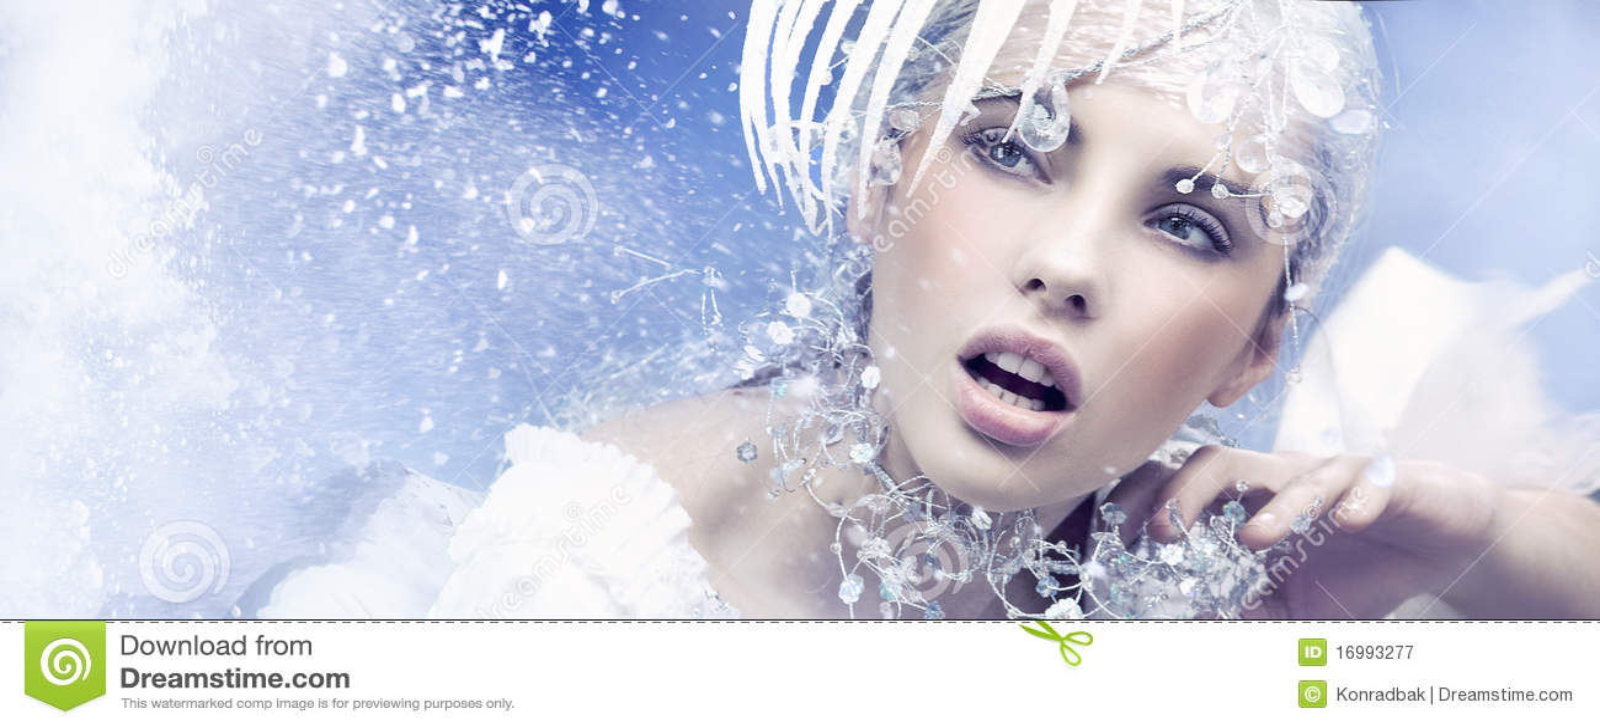 Dreamy Girl Wallpaper Winter Queen Stock Image Image Of Blue Fantasy